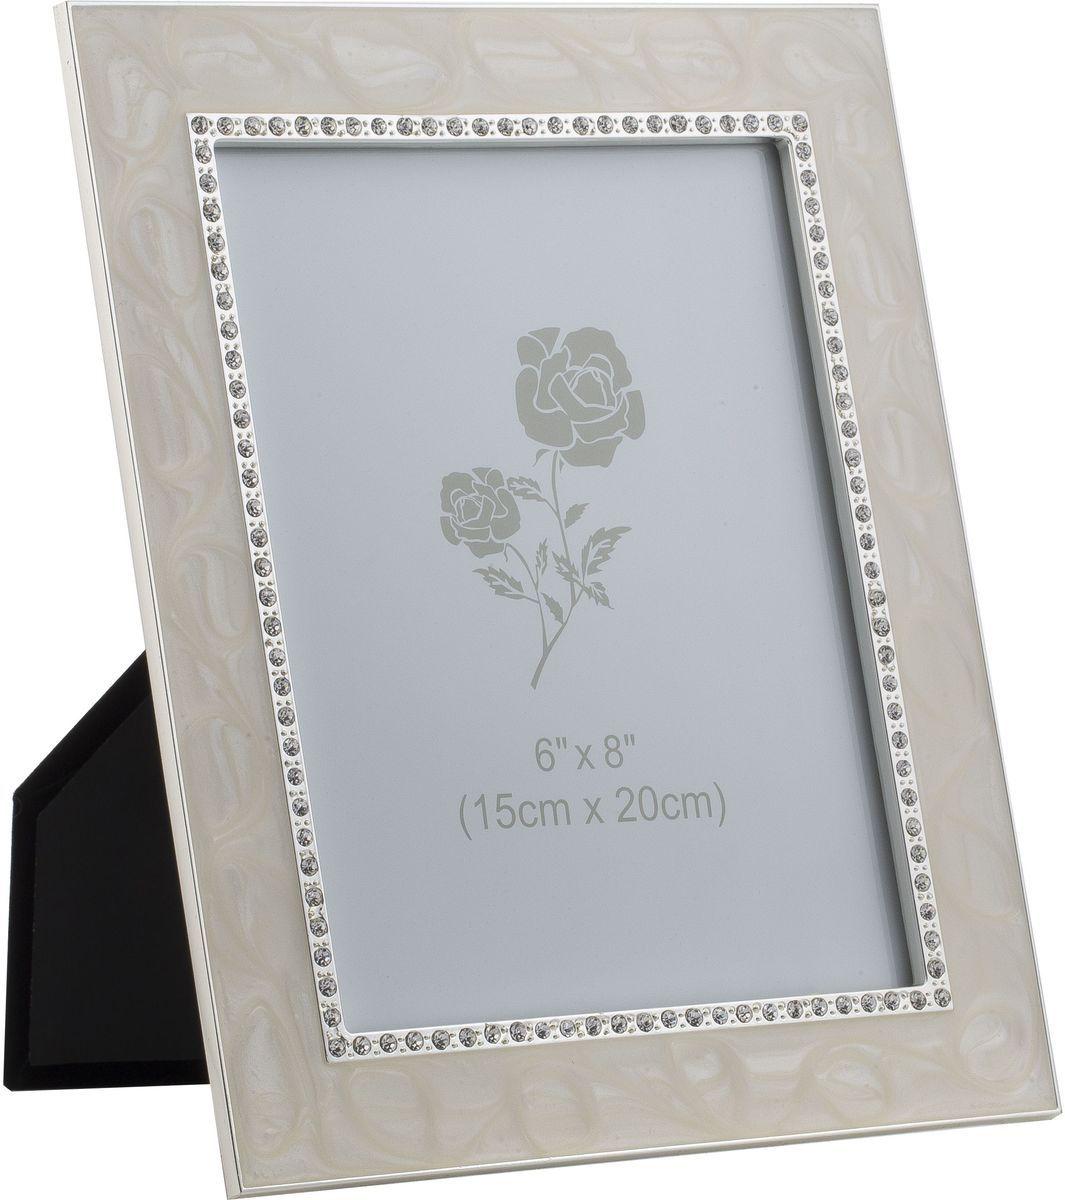 Фоторамка декоративная Platinum, 15 х 20 см. PF2034-6PLATINUM PF2034-6